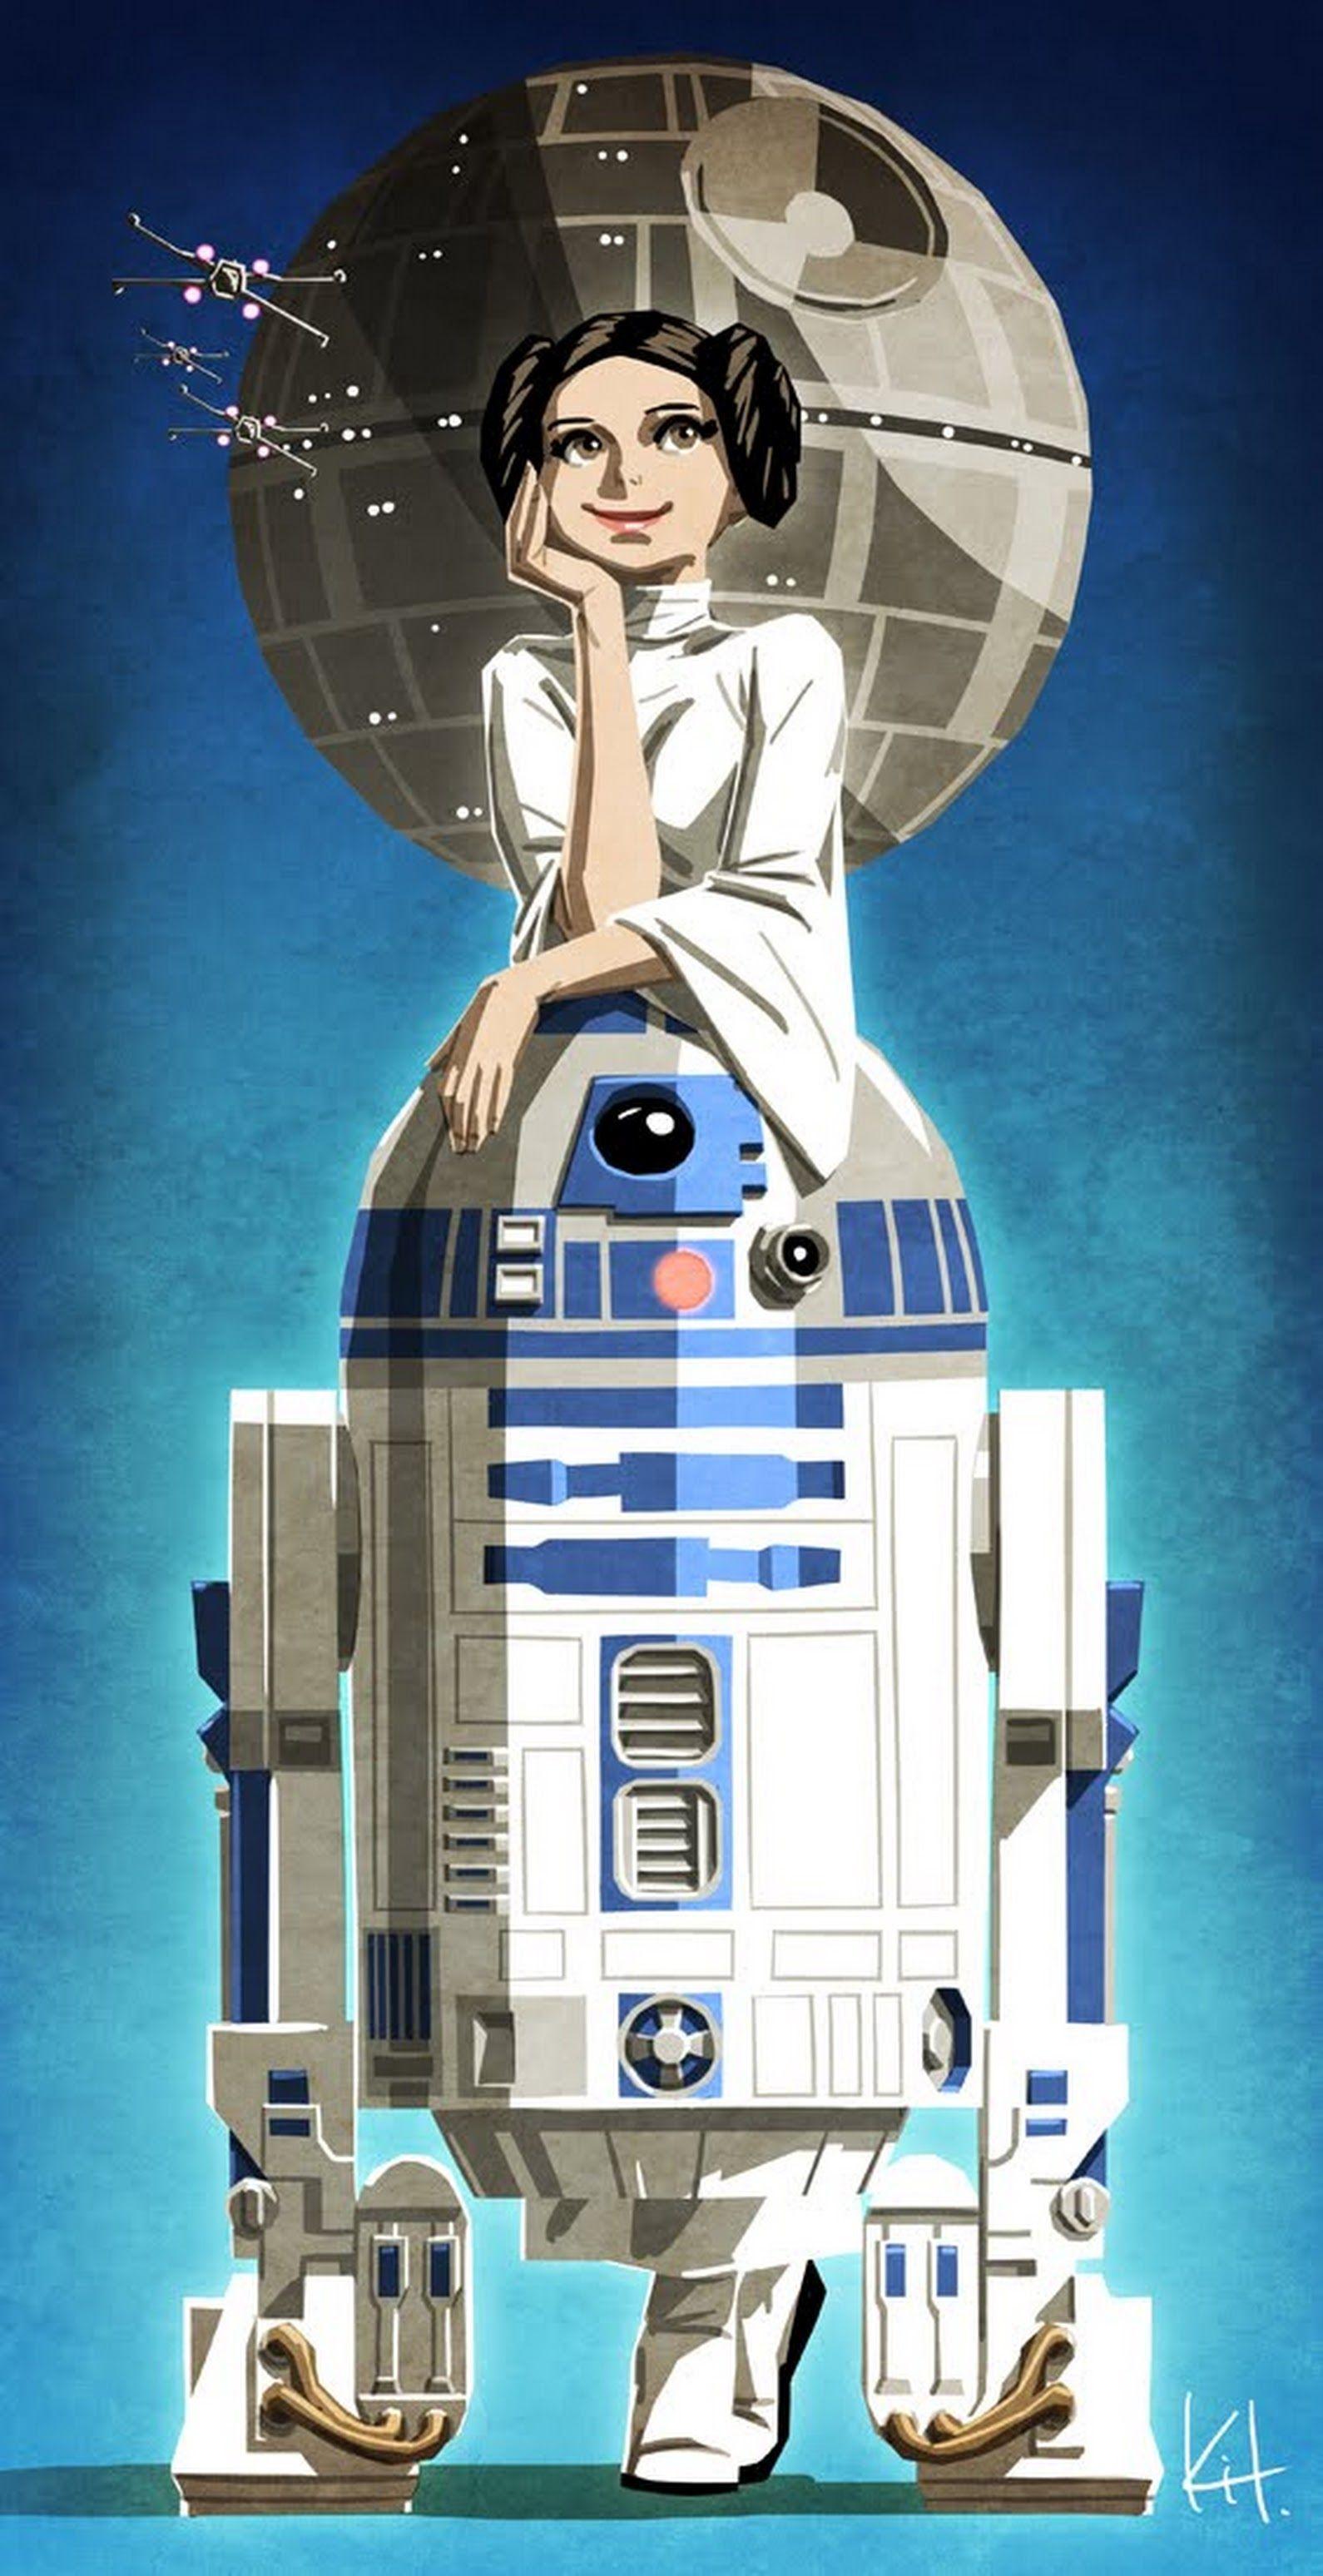 Sign In Star Wars Wallpaper Star Wars Poster Star Wars Artwork